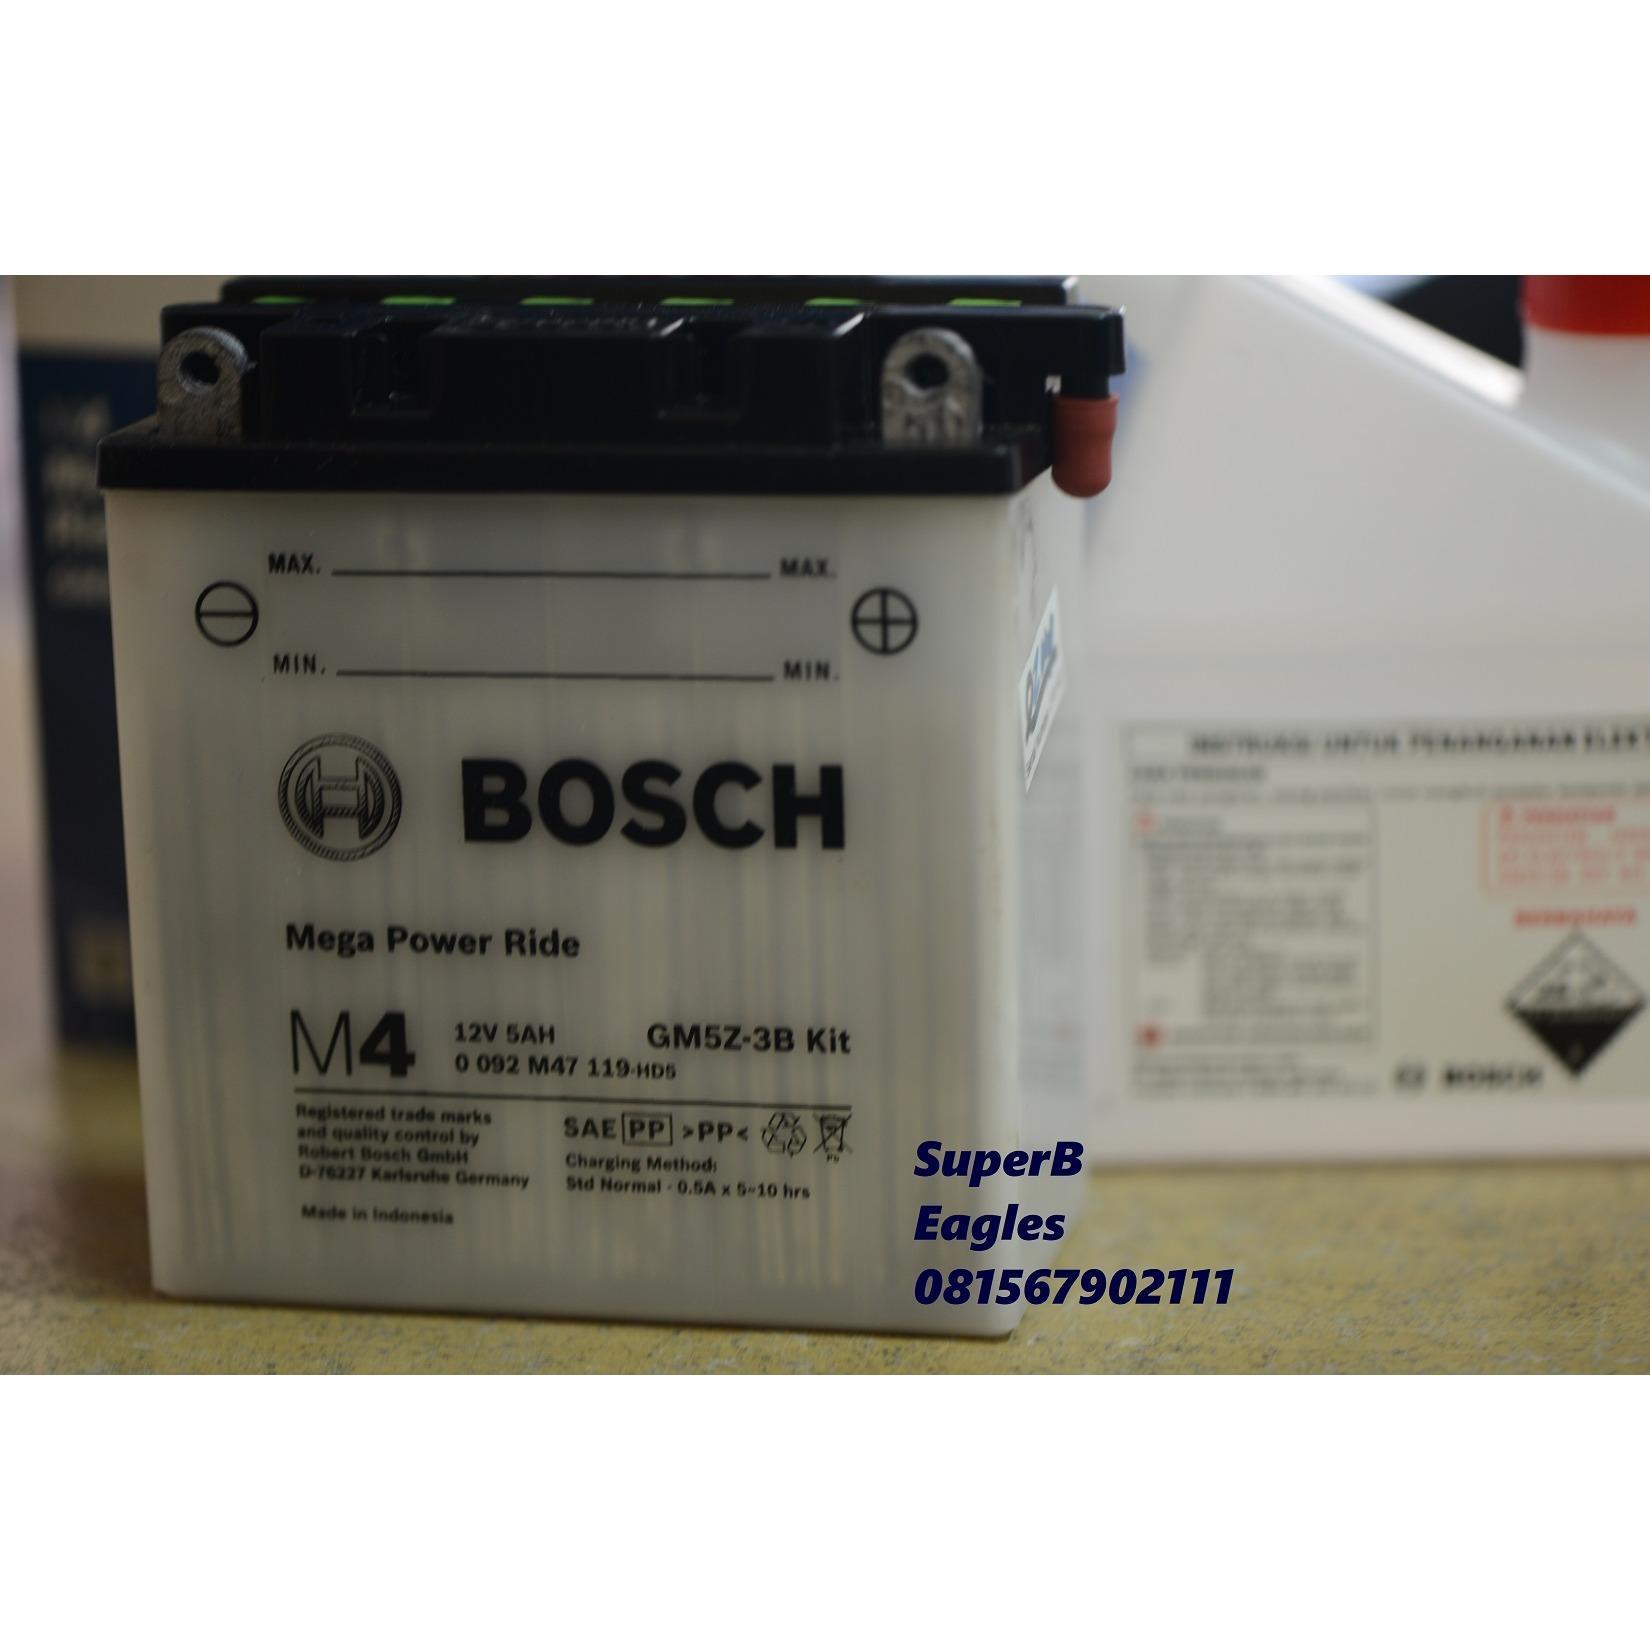 AKI MOTOR BOSCH GM5Z-3B KIT Basah  ASLI original Dry-charged